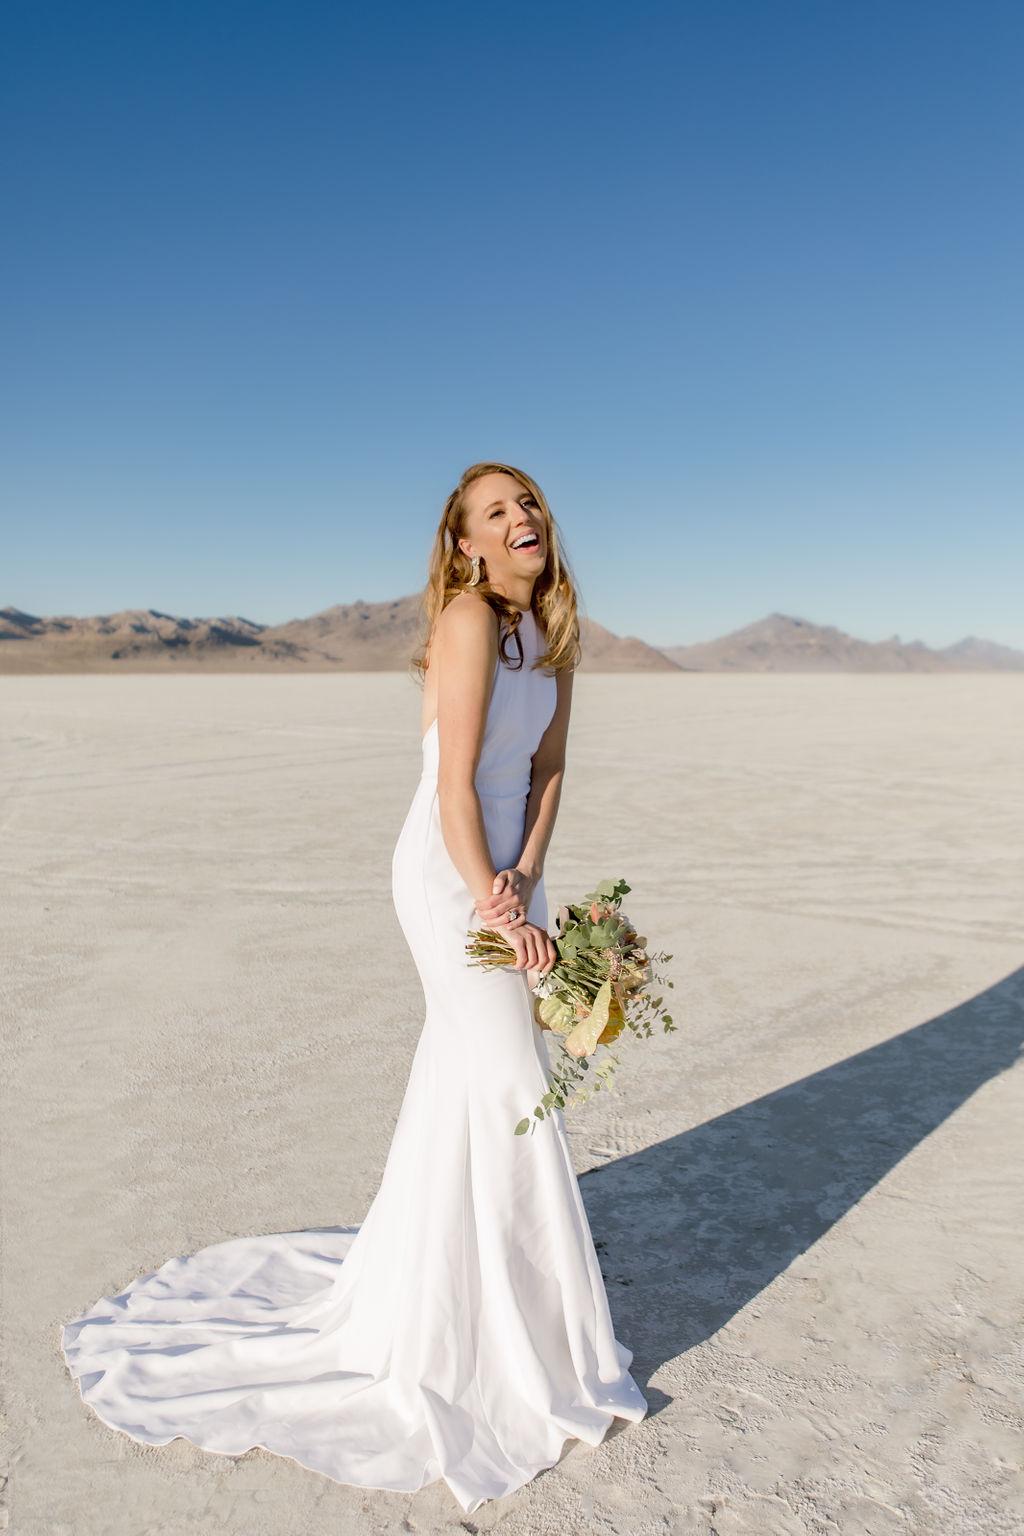 Simple Elegant Modern Goli June Brighton Wedding Dress Victoria Chukarov Salt Flats Utah 2